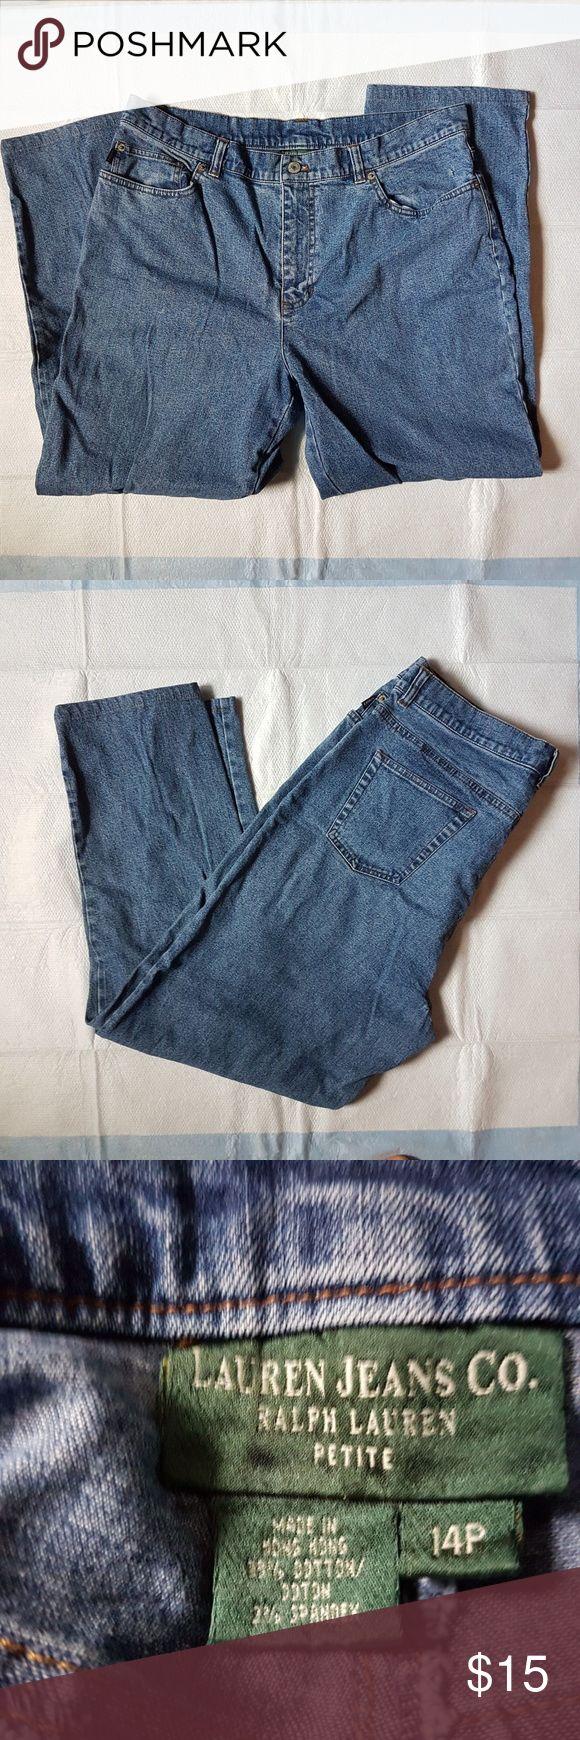 Ralph lauren jeans size petite smith nude latinas